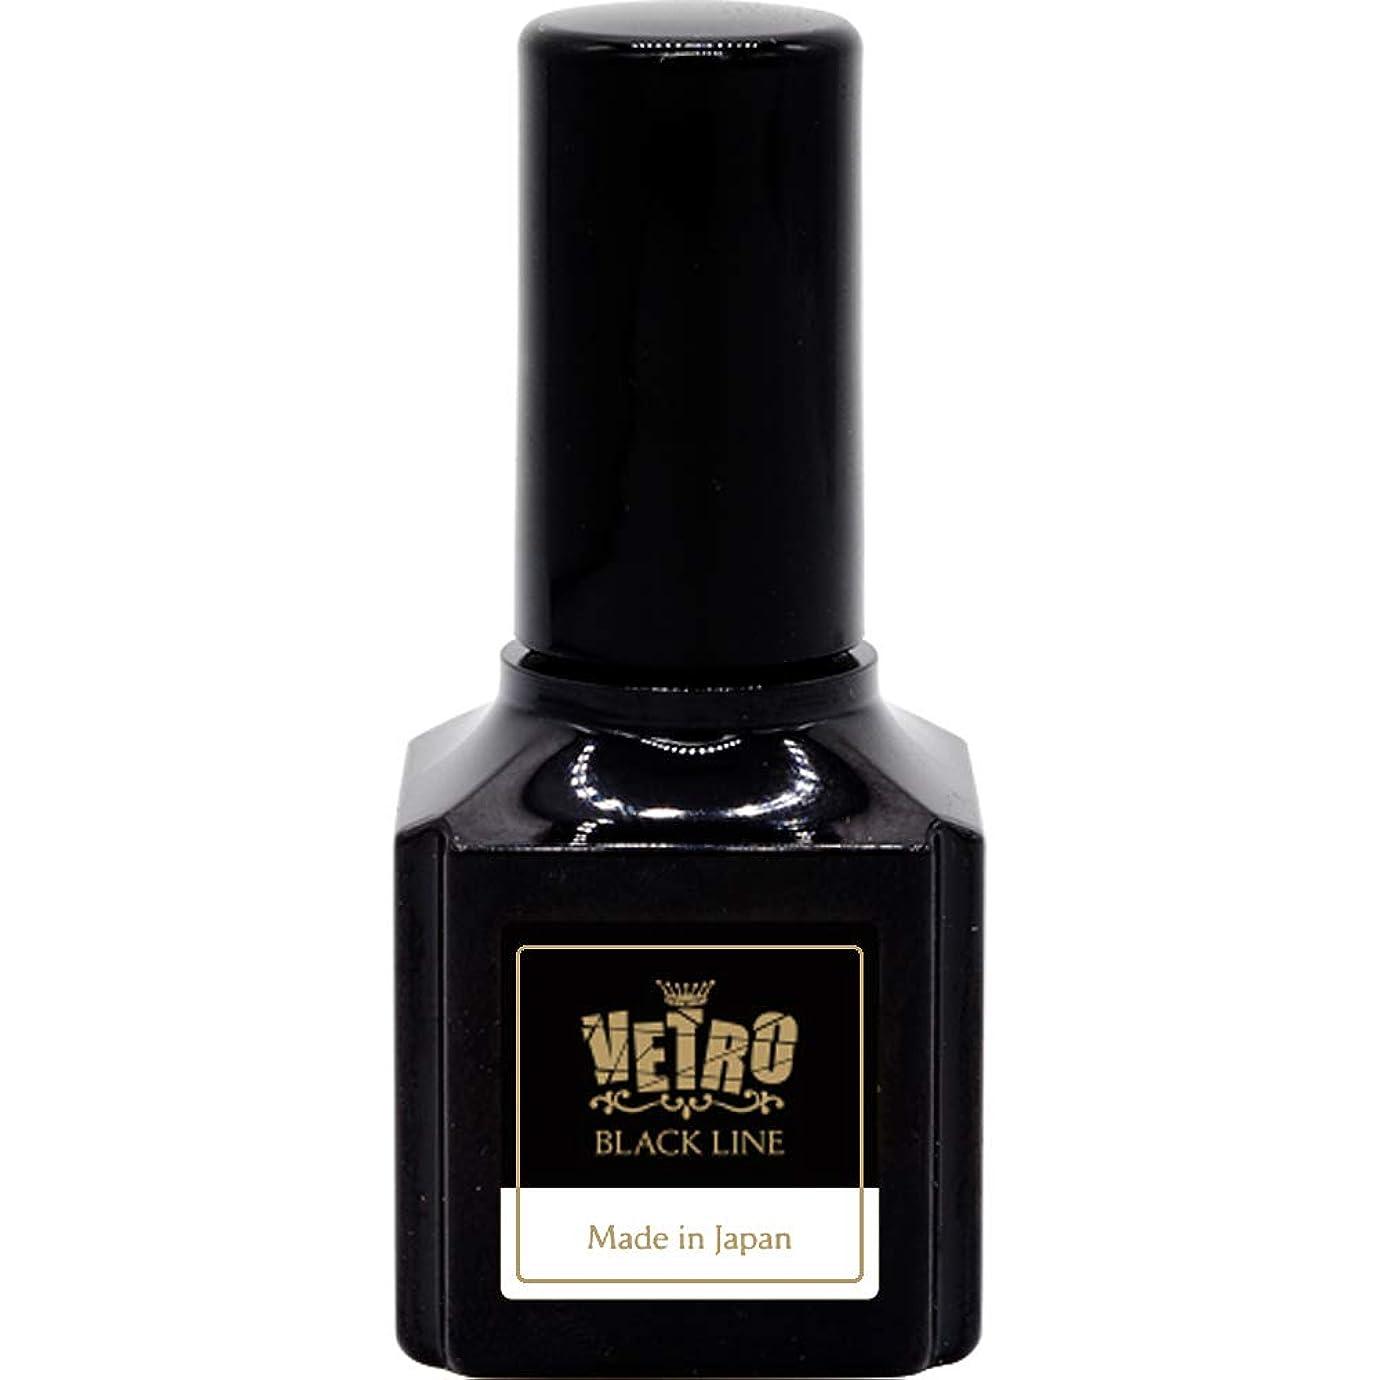 VETRO GP BLACK LINE カラージェル B187 スモークピンク 16ml UV/LED対応 ソークオフジェル